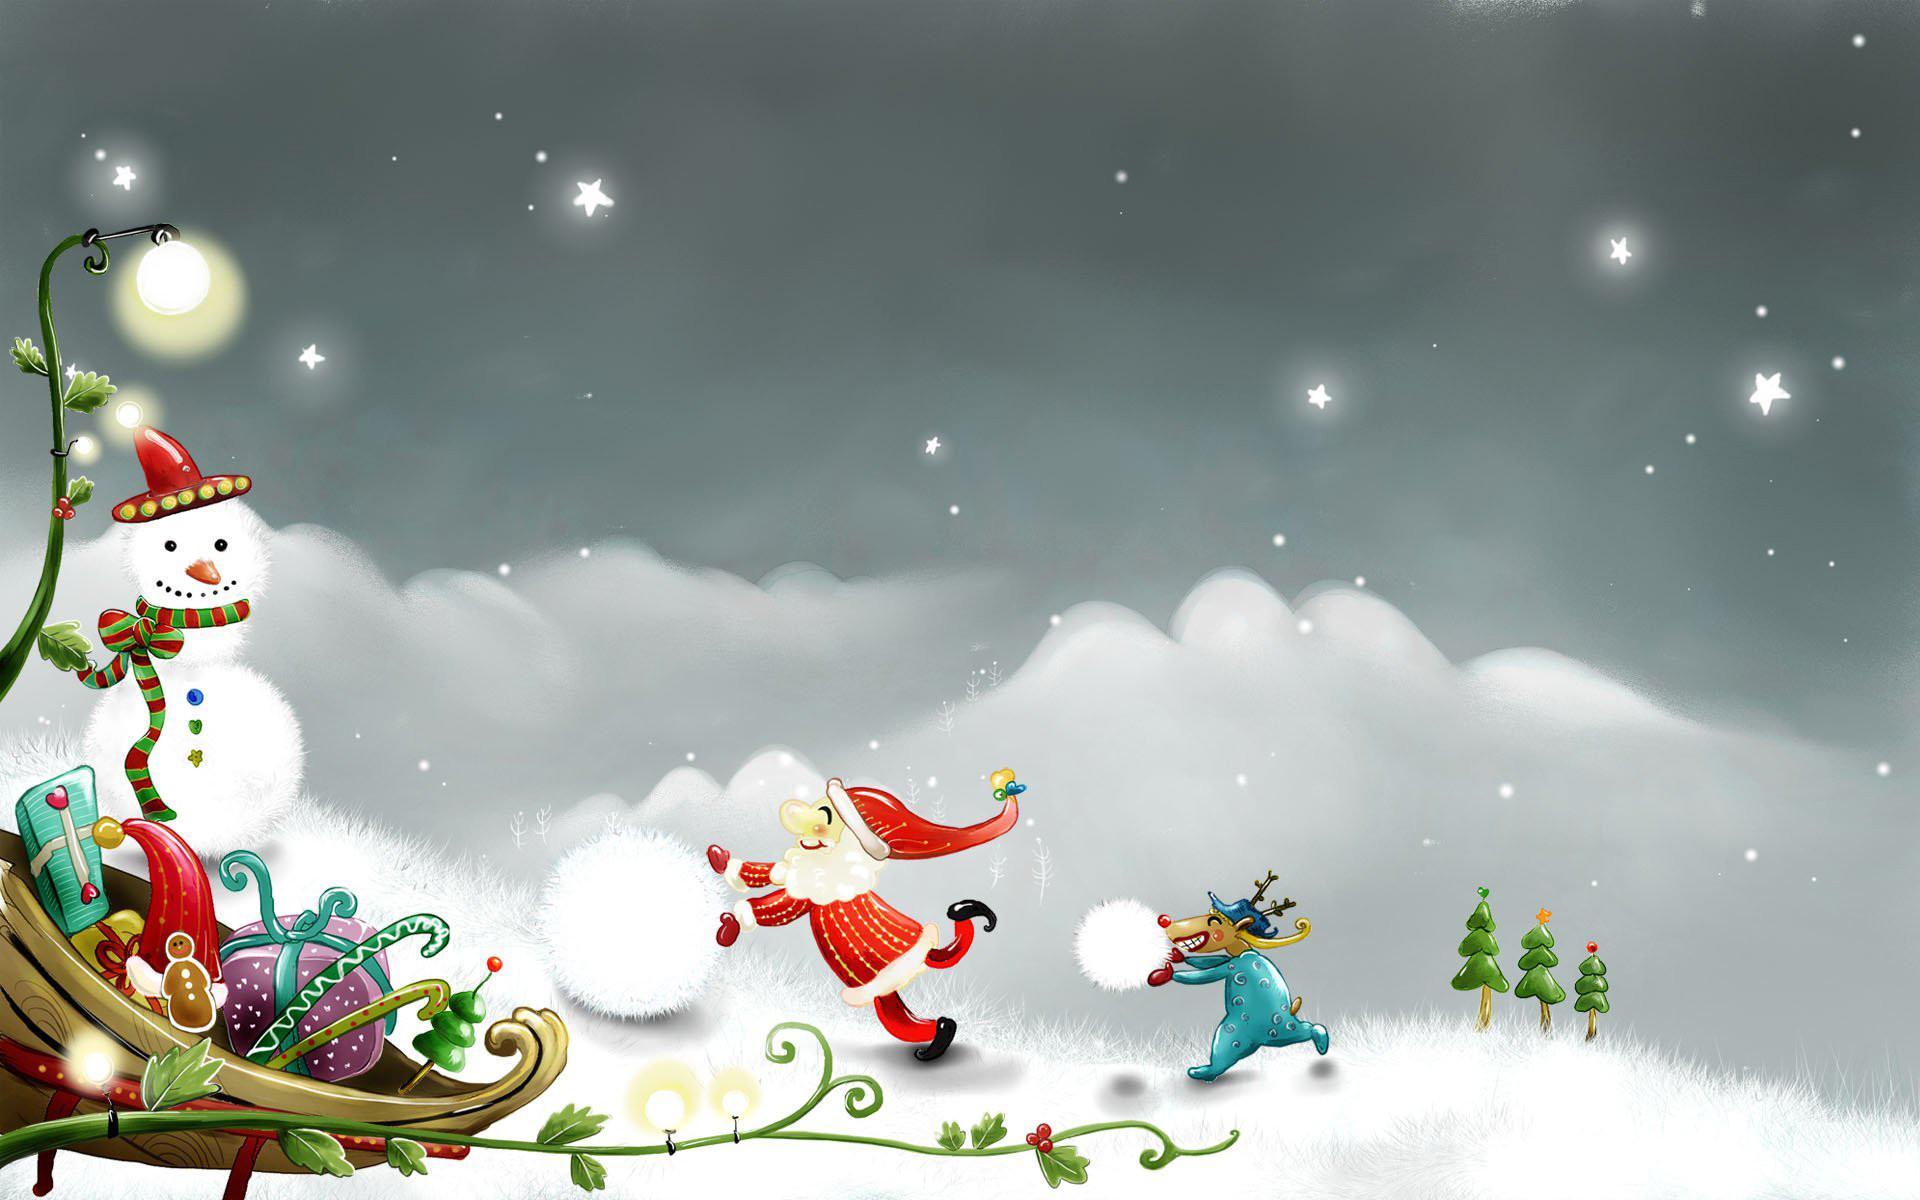 2015 merry Christmas desktop background